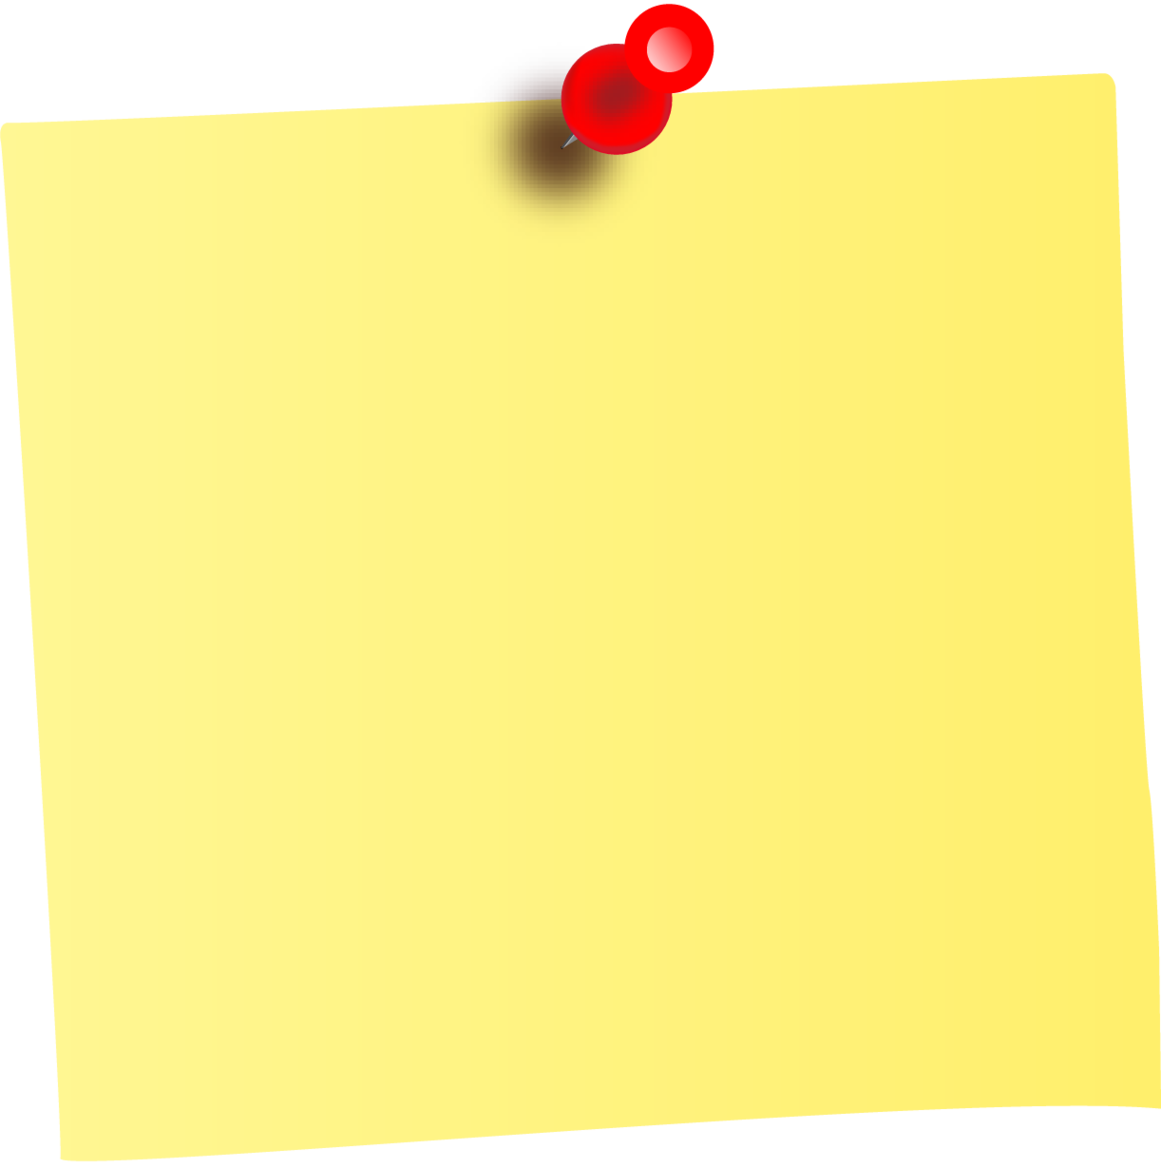 Sticky note PNG - Stickynotes HD PNG